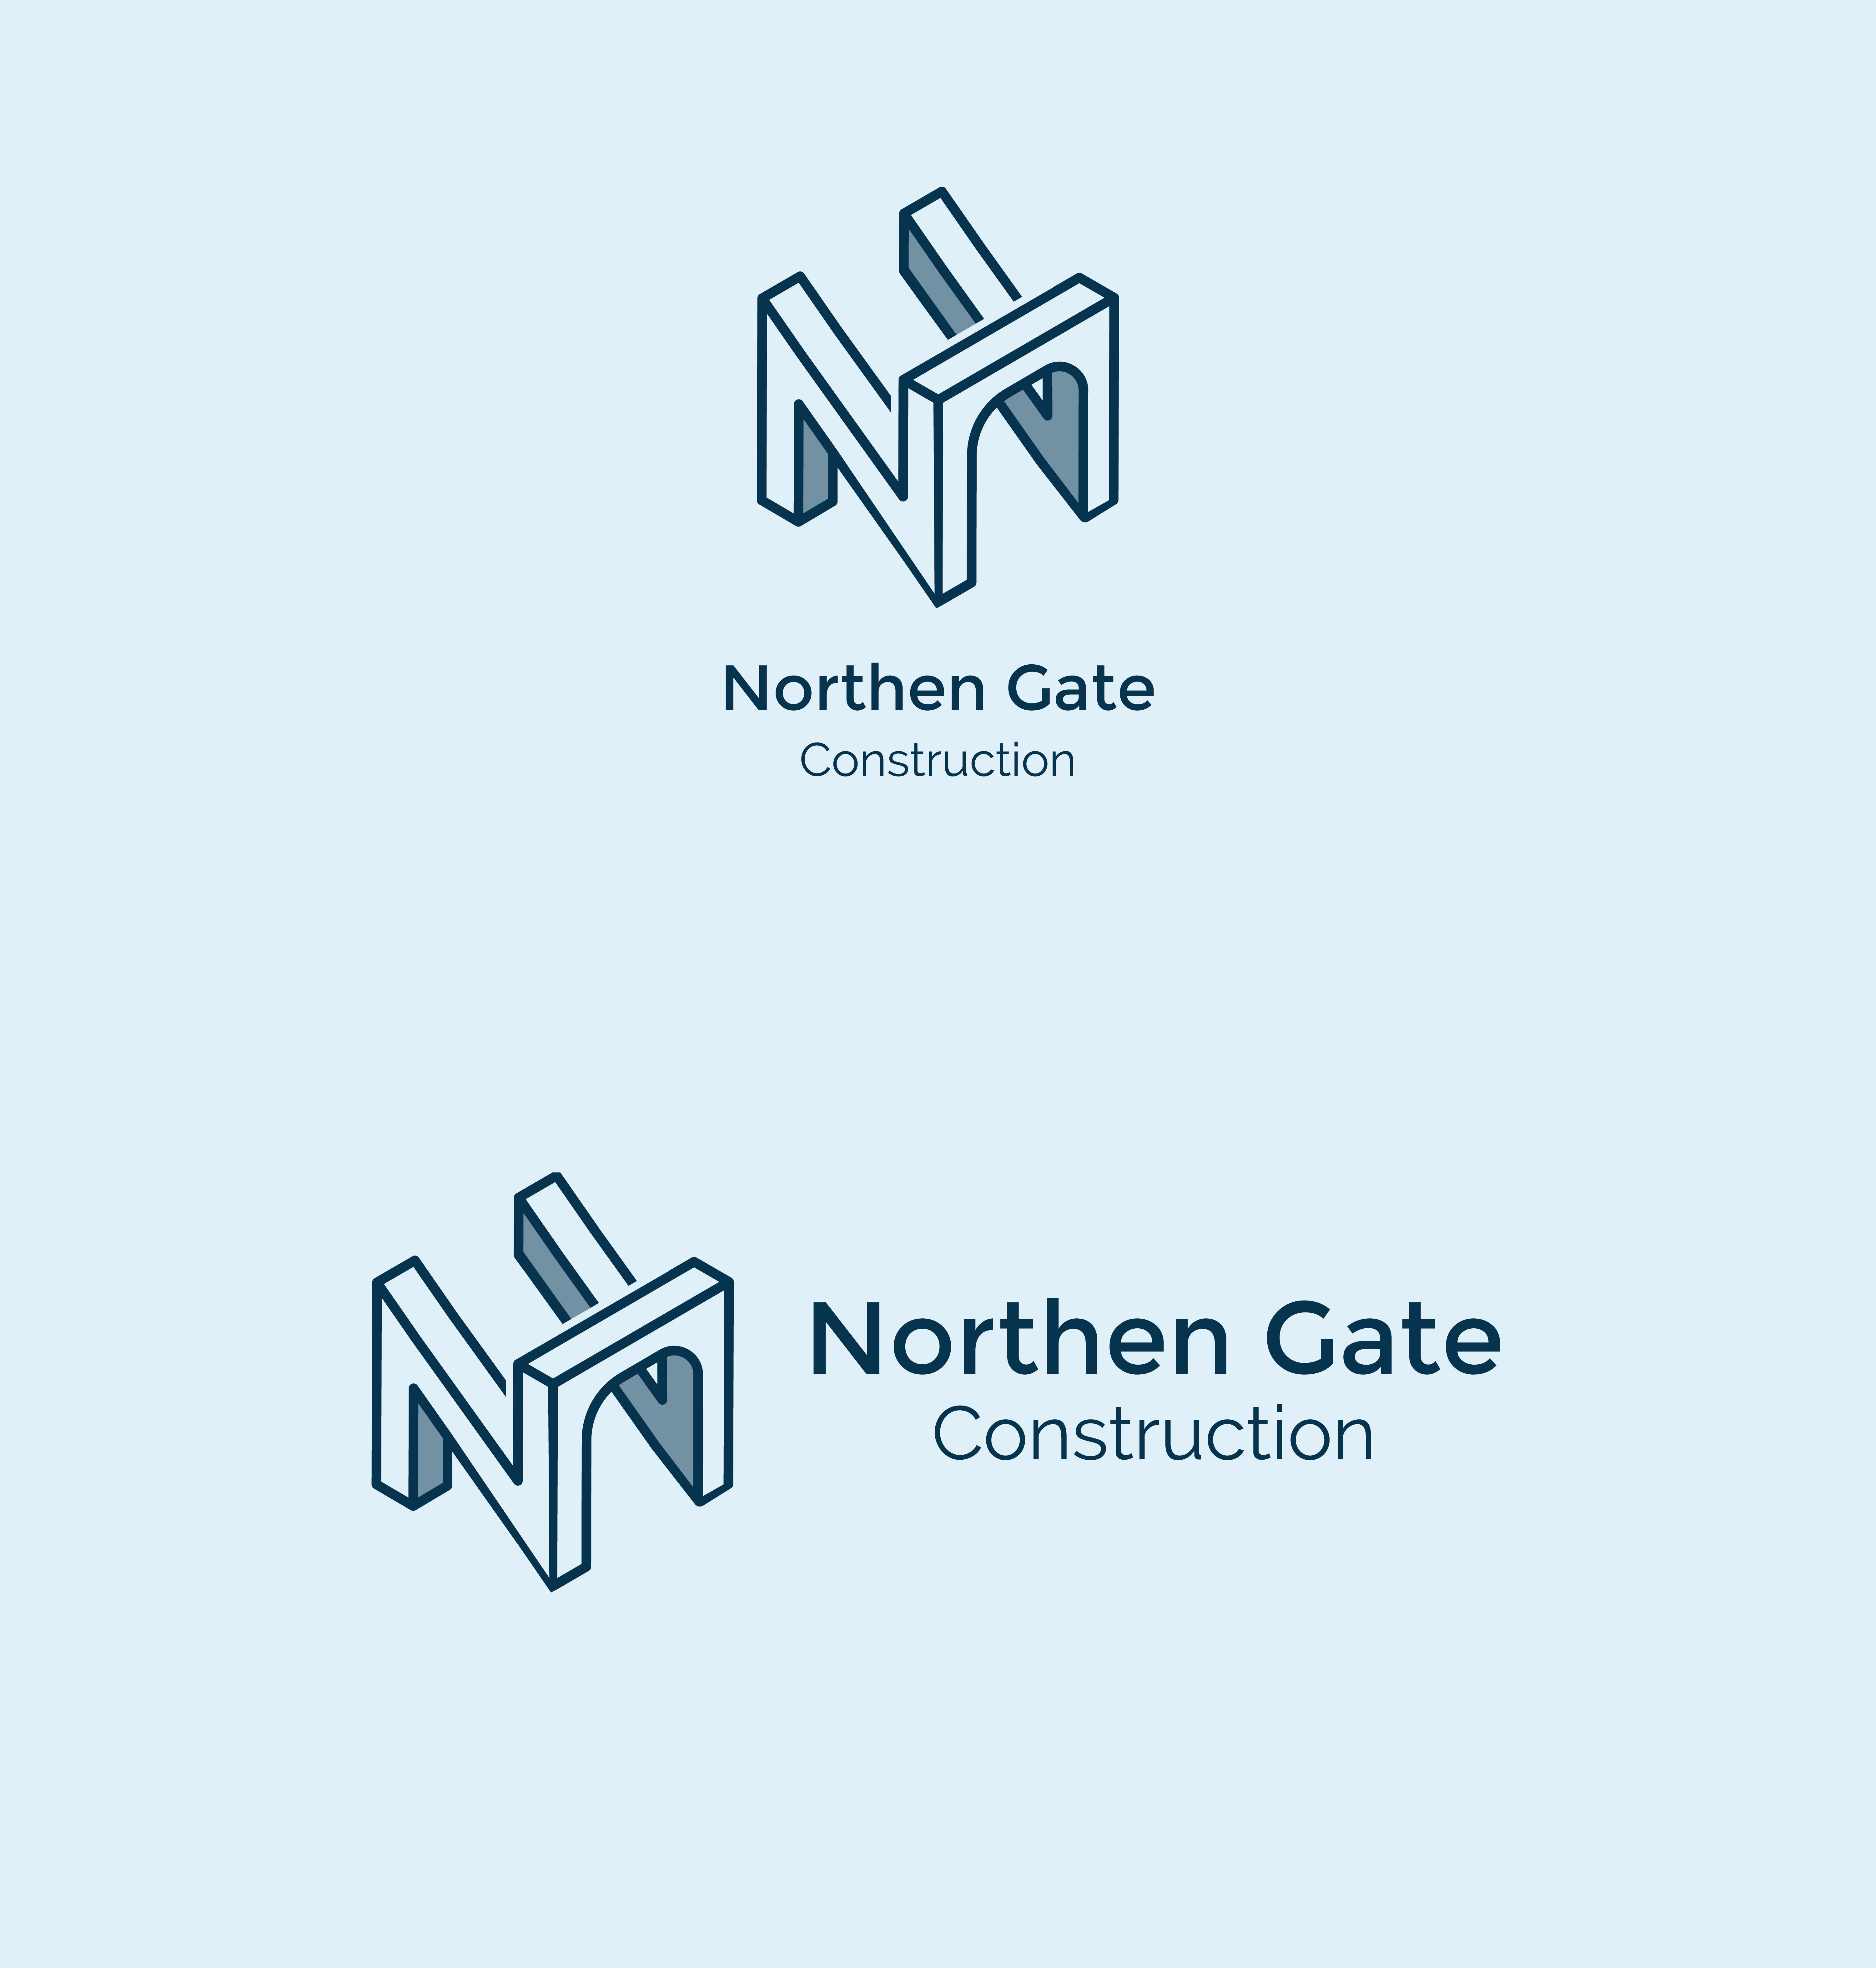 Letter N - Construction Gate Bridge Logo Logo Template example image 6